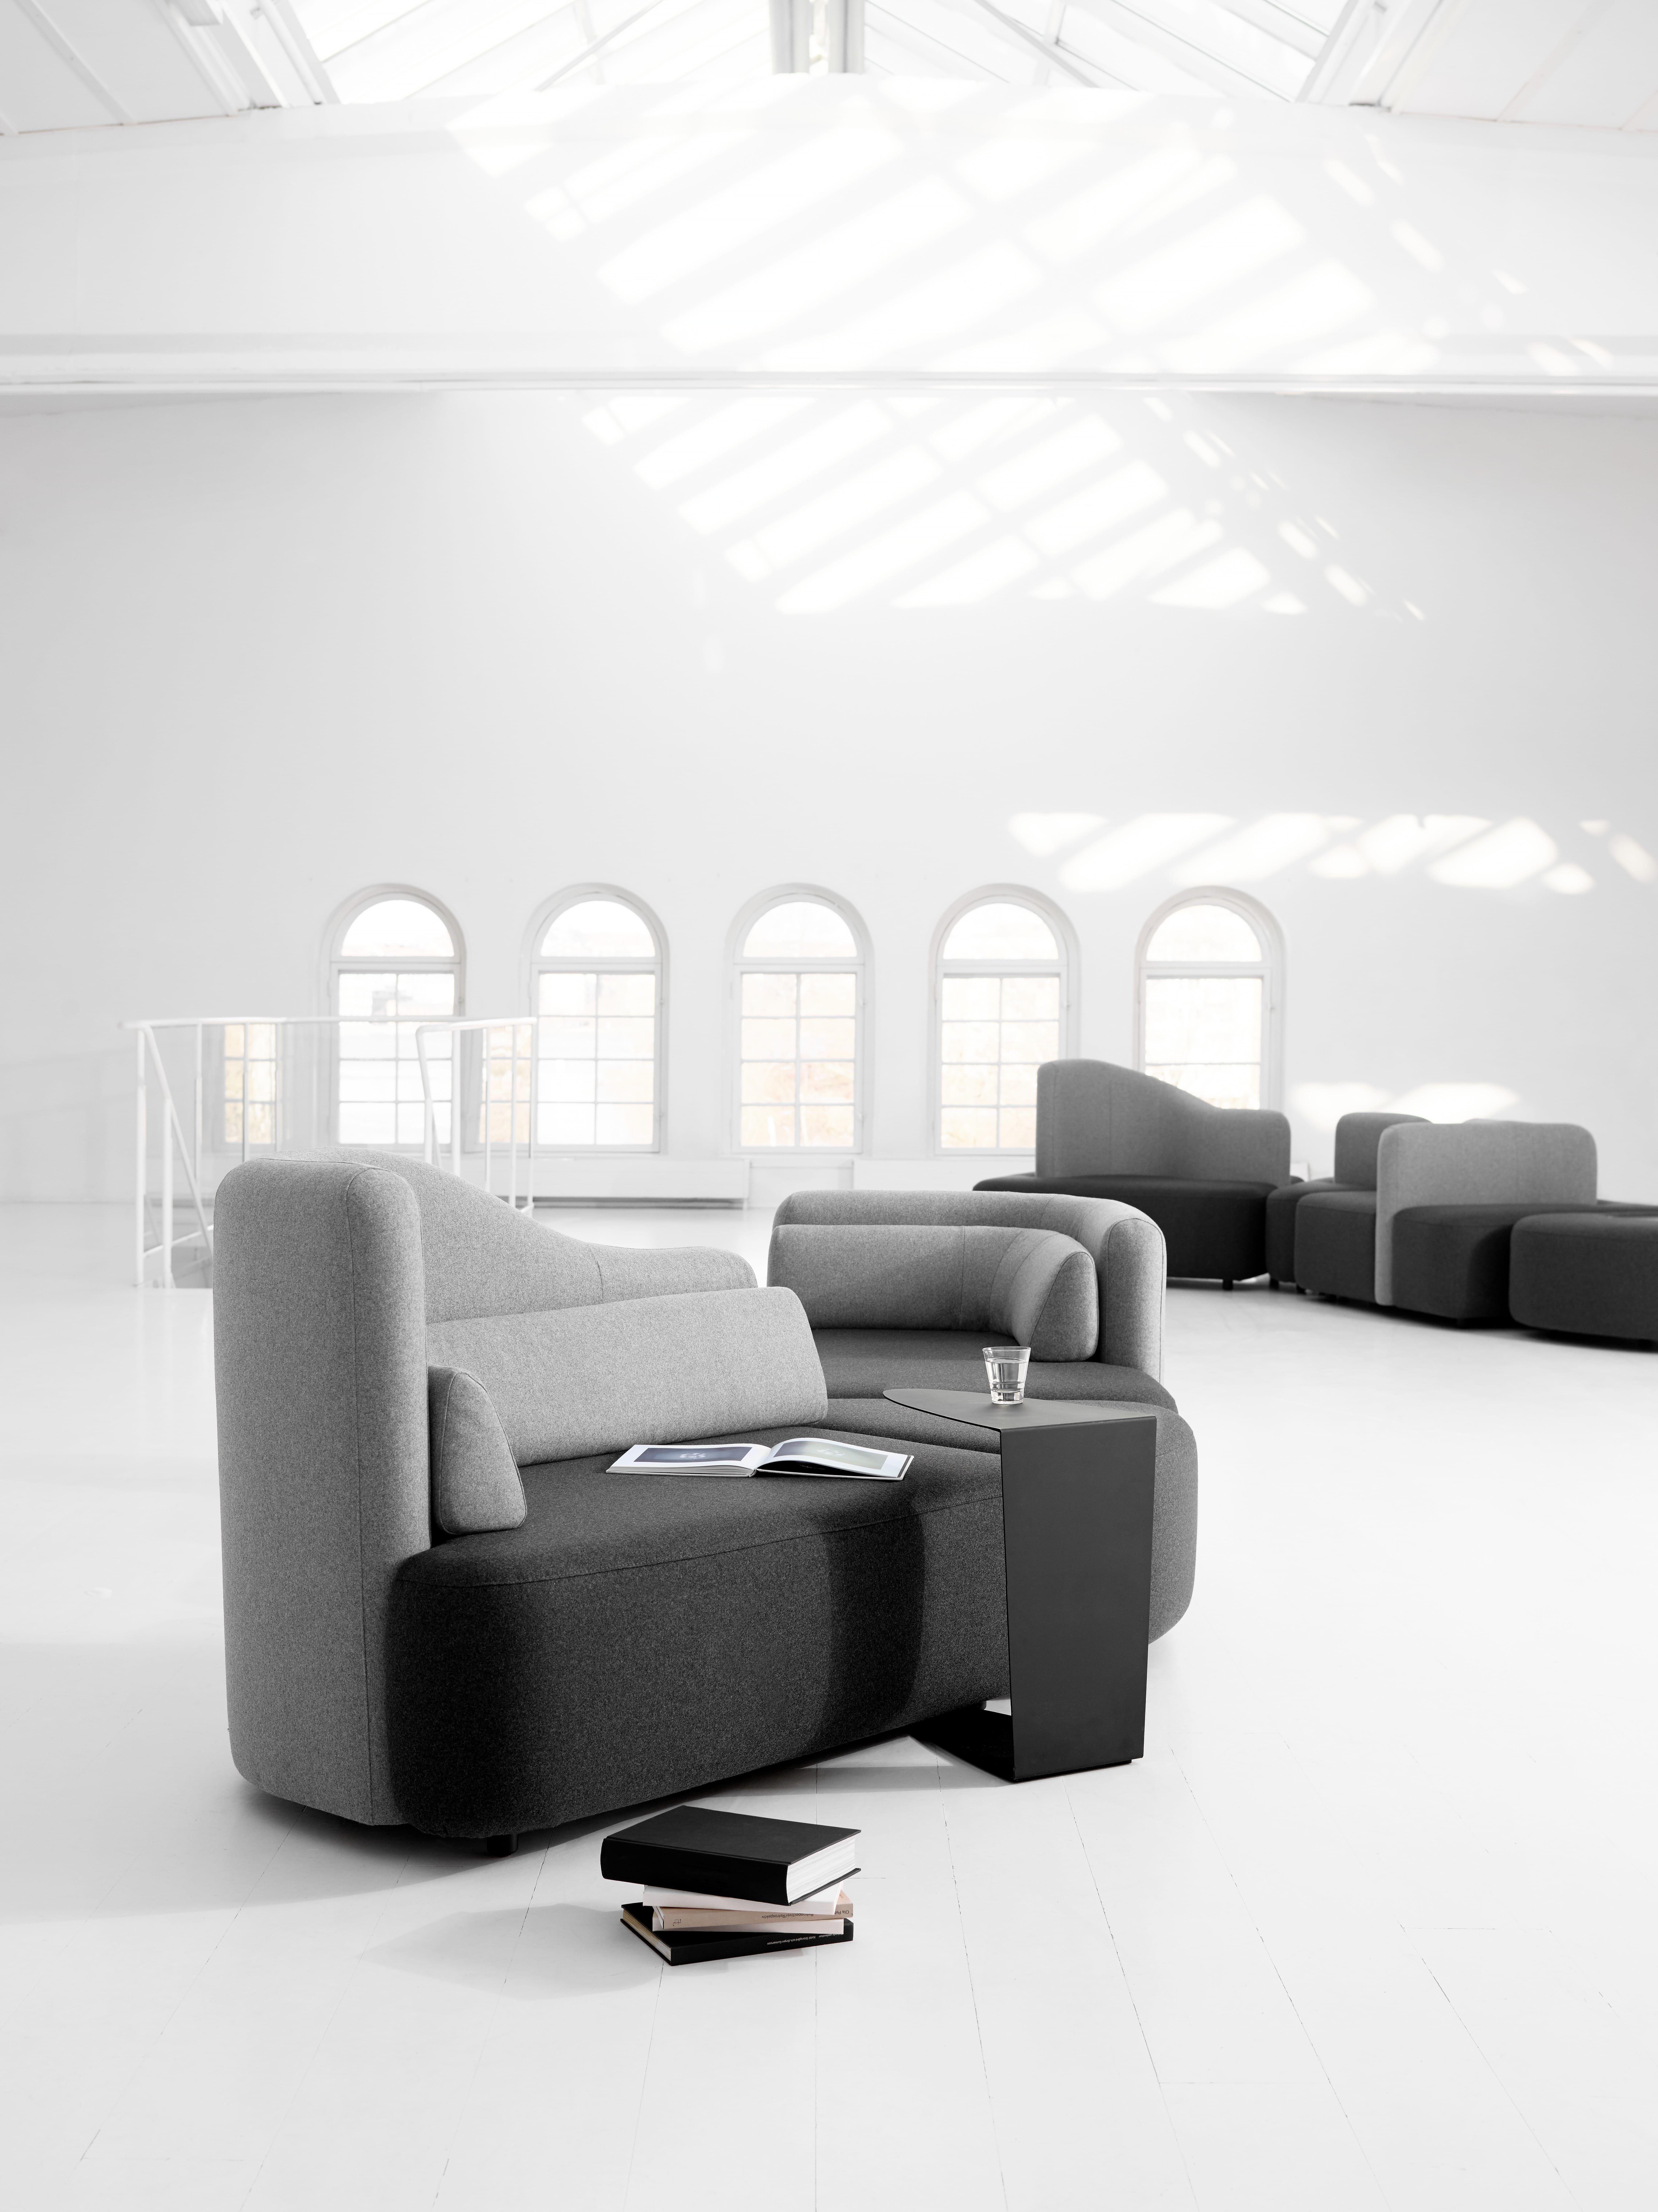 Ottawa Sofa Von Karim Rashid Boconcept Scandinaviandesign Interiordesign Design Furniture Design Modern Boconcept Living Room Scandinavian